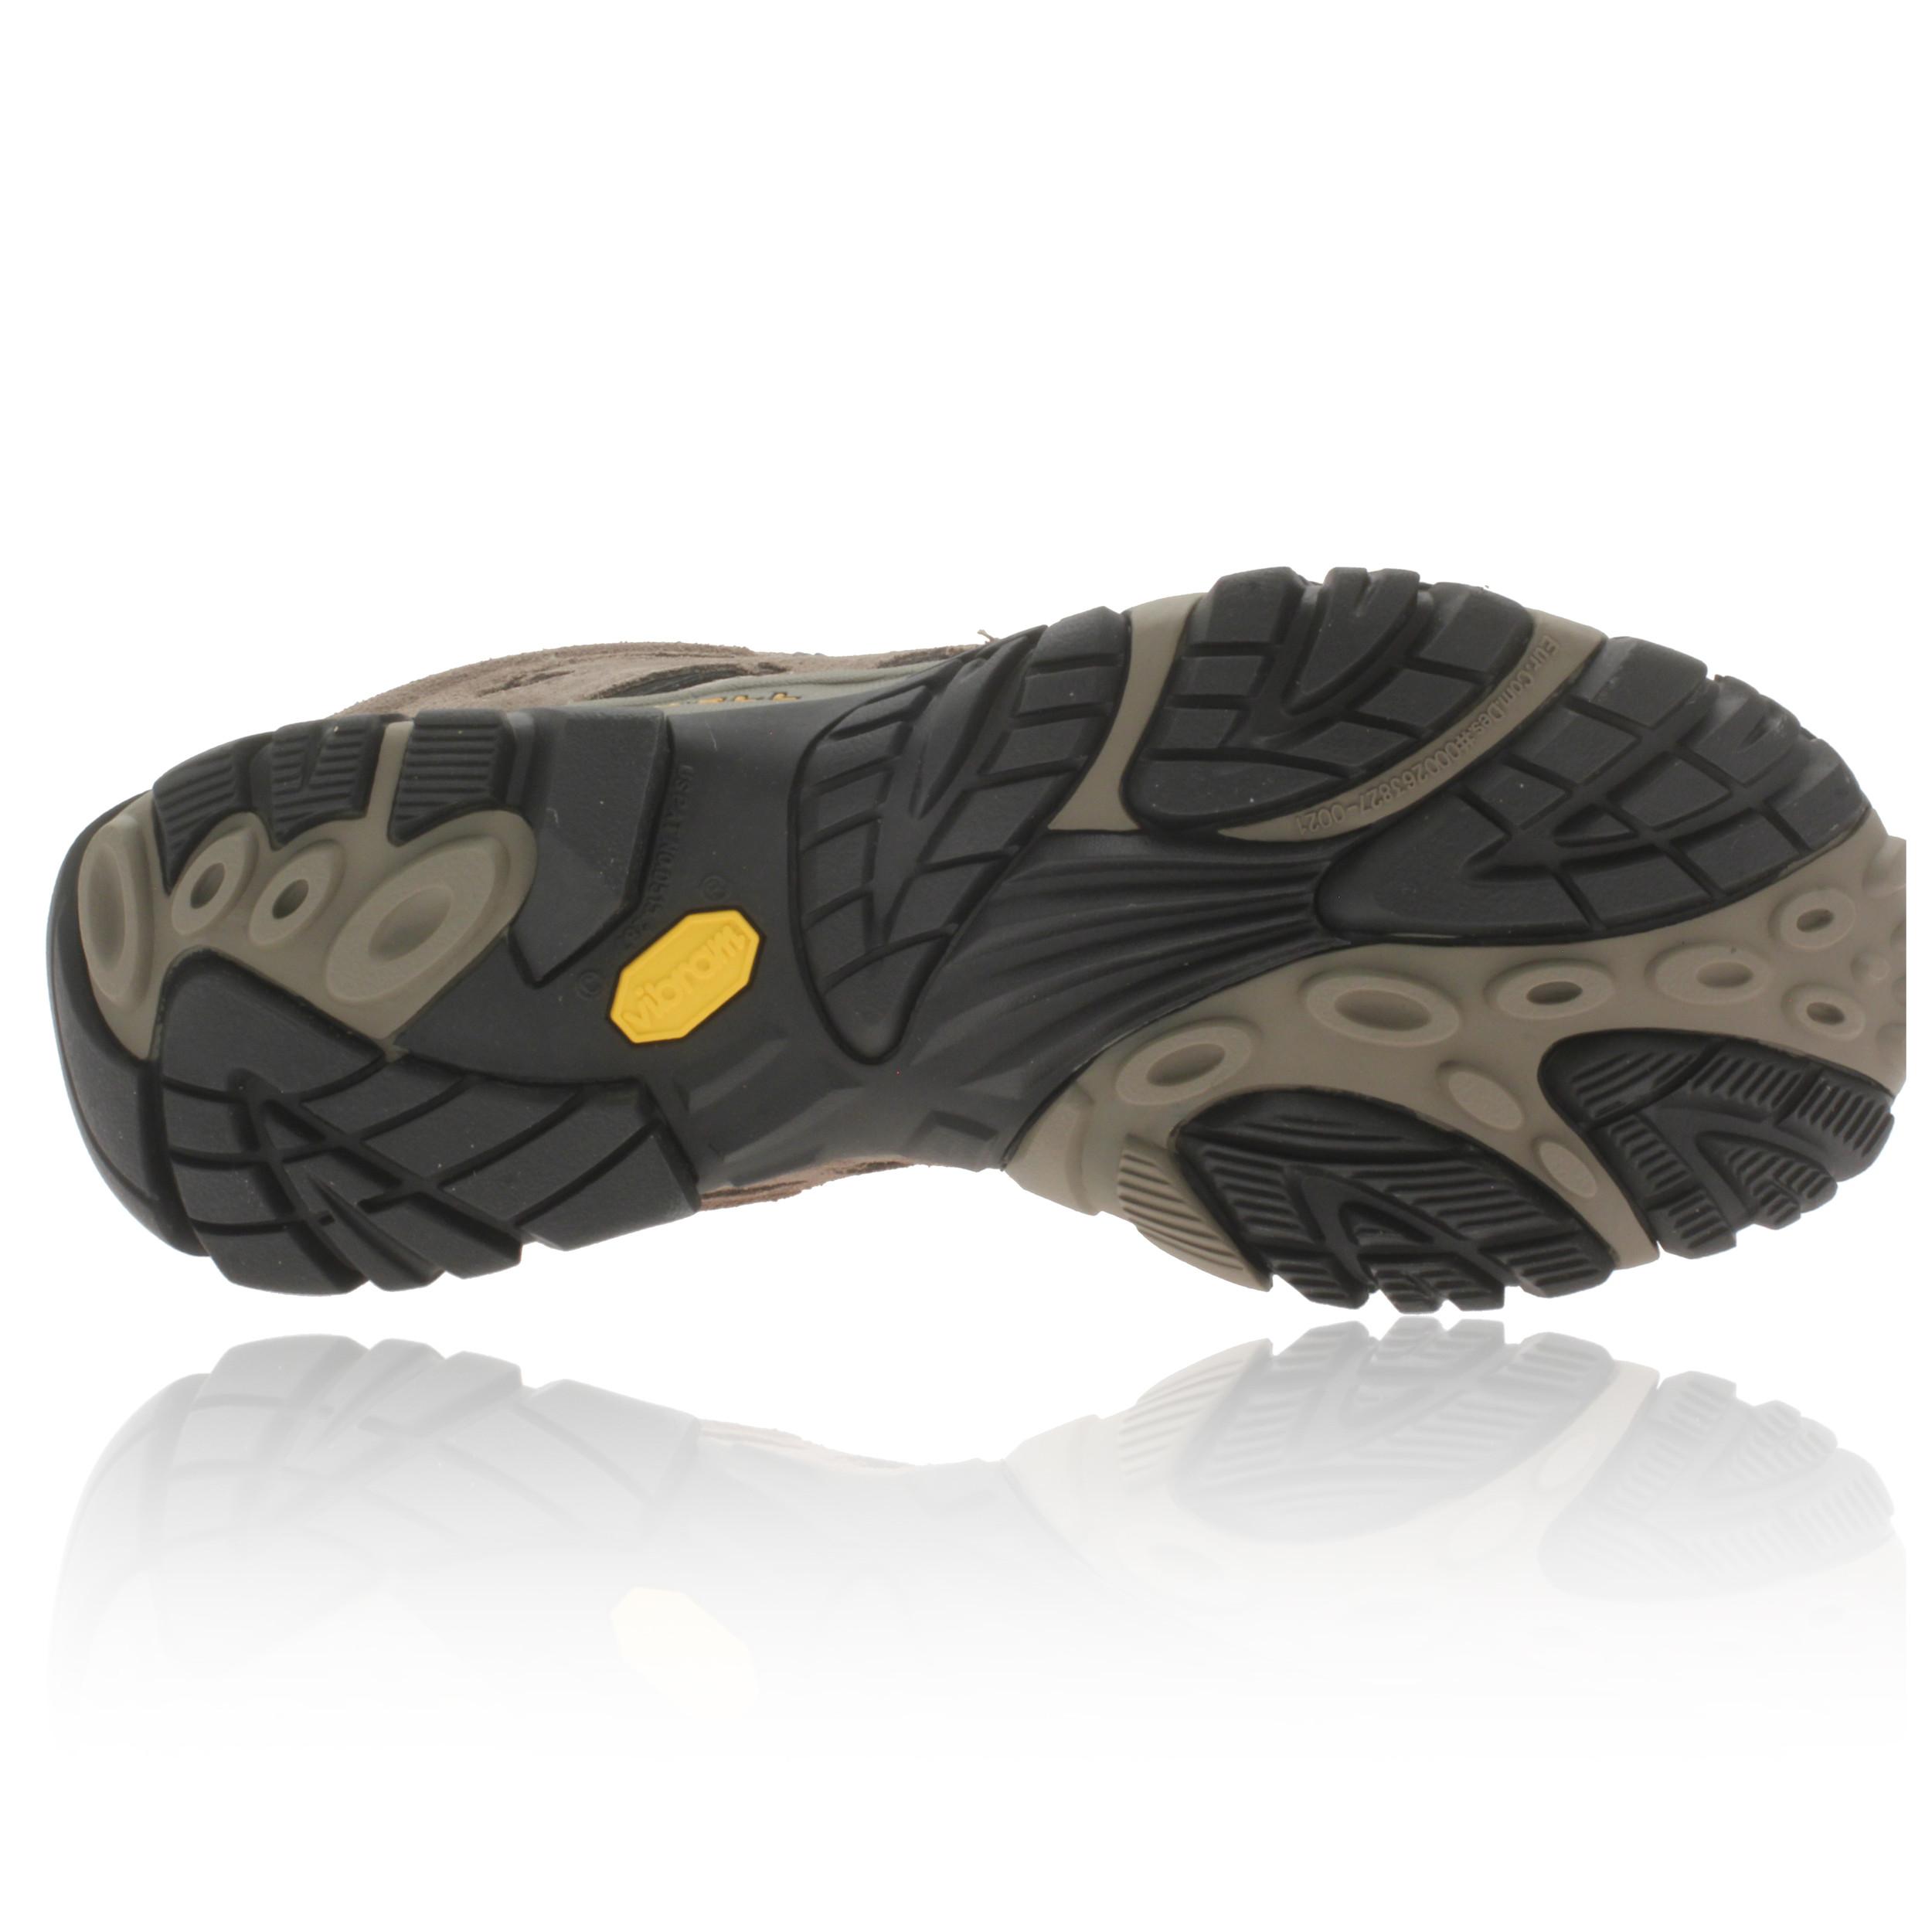 Merrell Air Cushion Shoes Ortholite